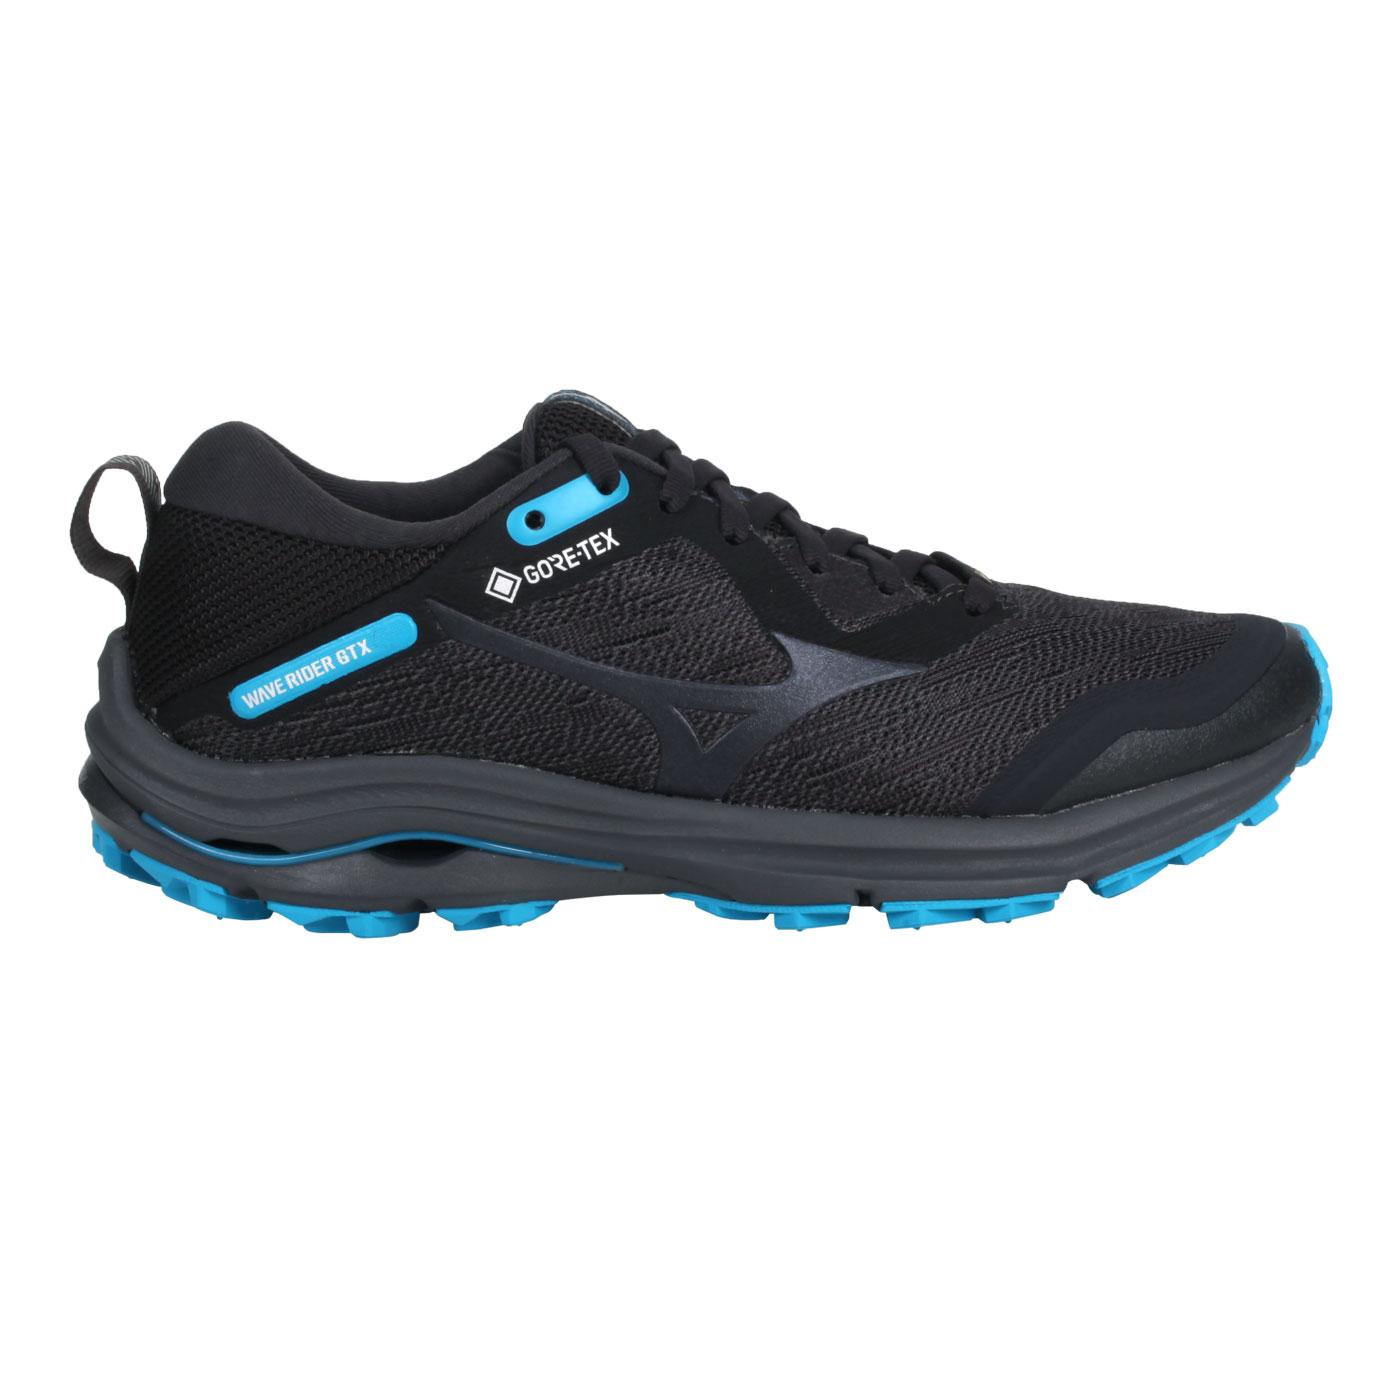 MIZUNO 女款慢跑鞋  @WAVE RIDER GTX@J1GD217913 - 灰水藍